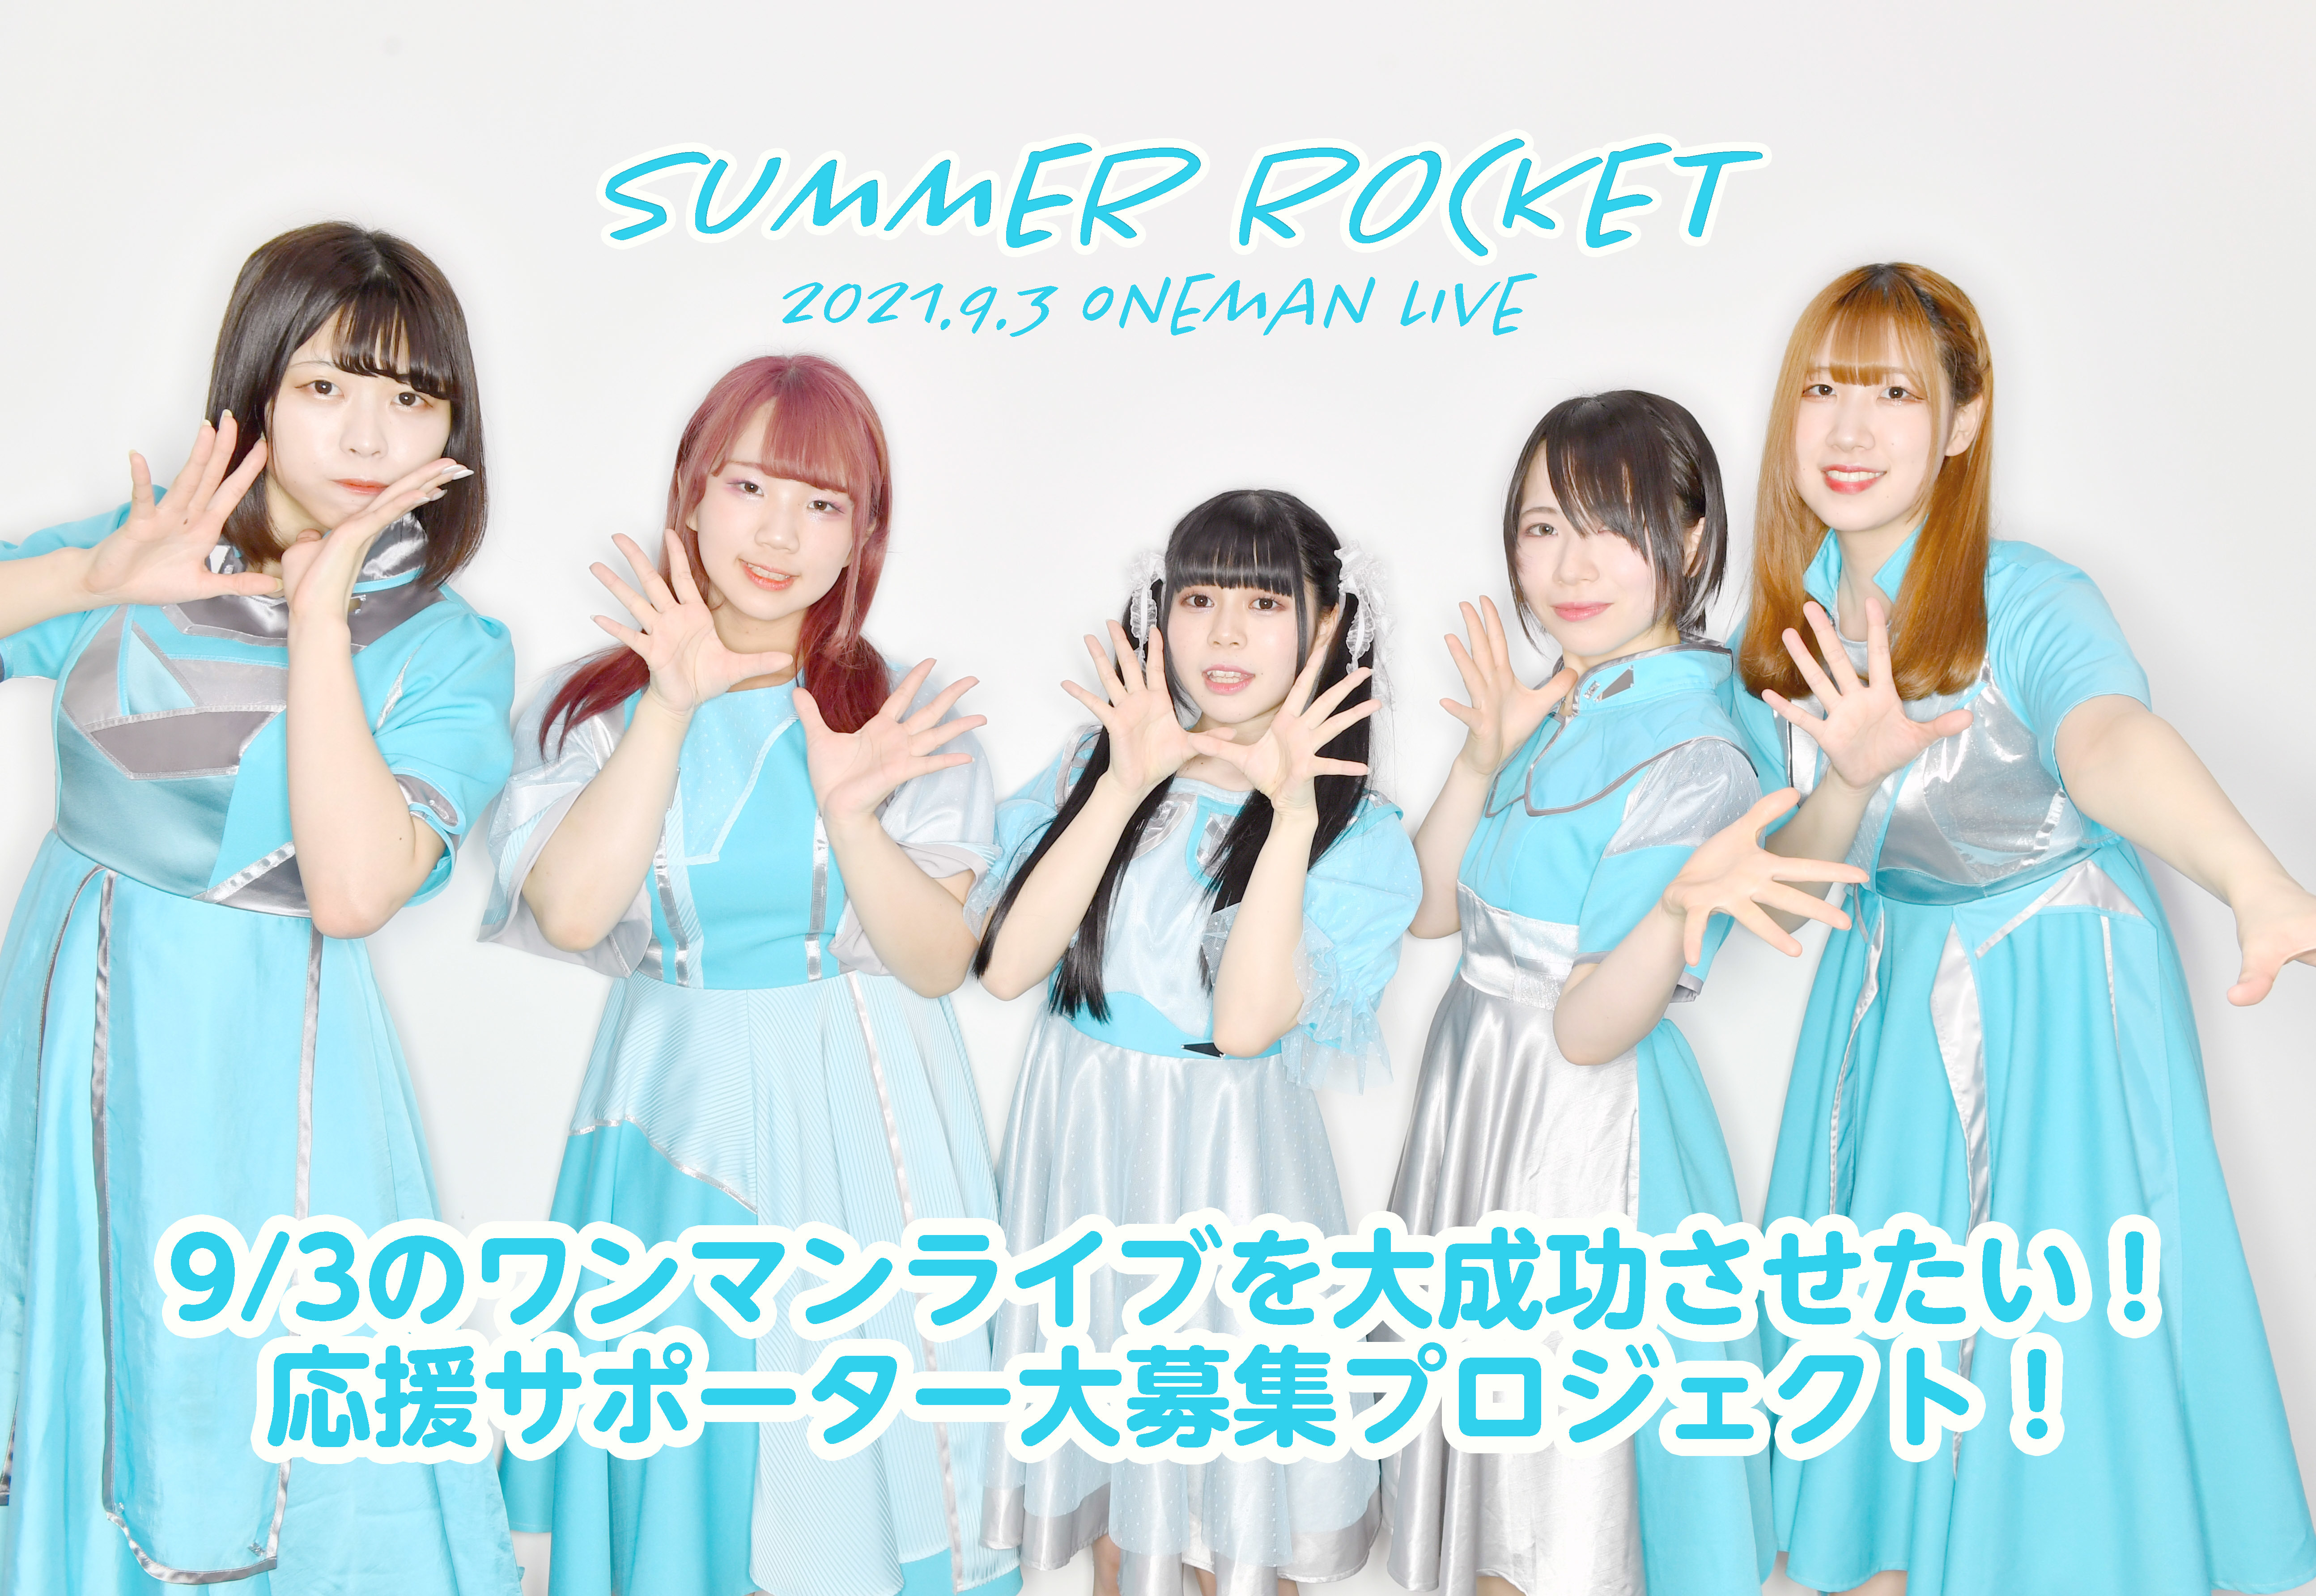 【SUMMER ROCKET】9/3のワンマンライブを大成功させたい!応援サポーター大募集プロジェクト!